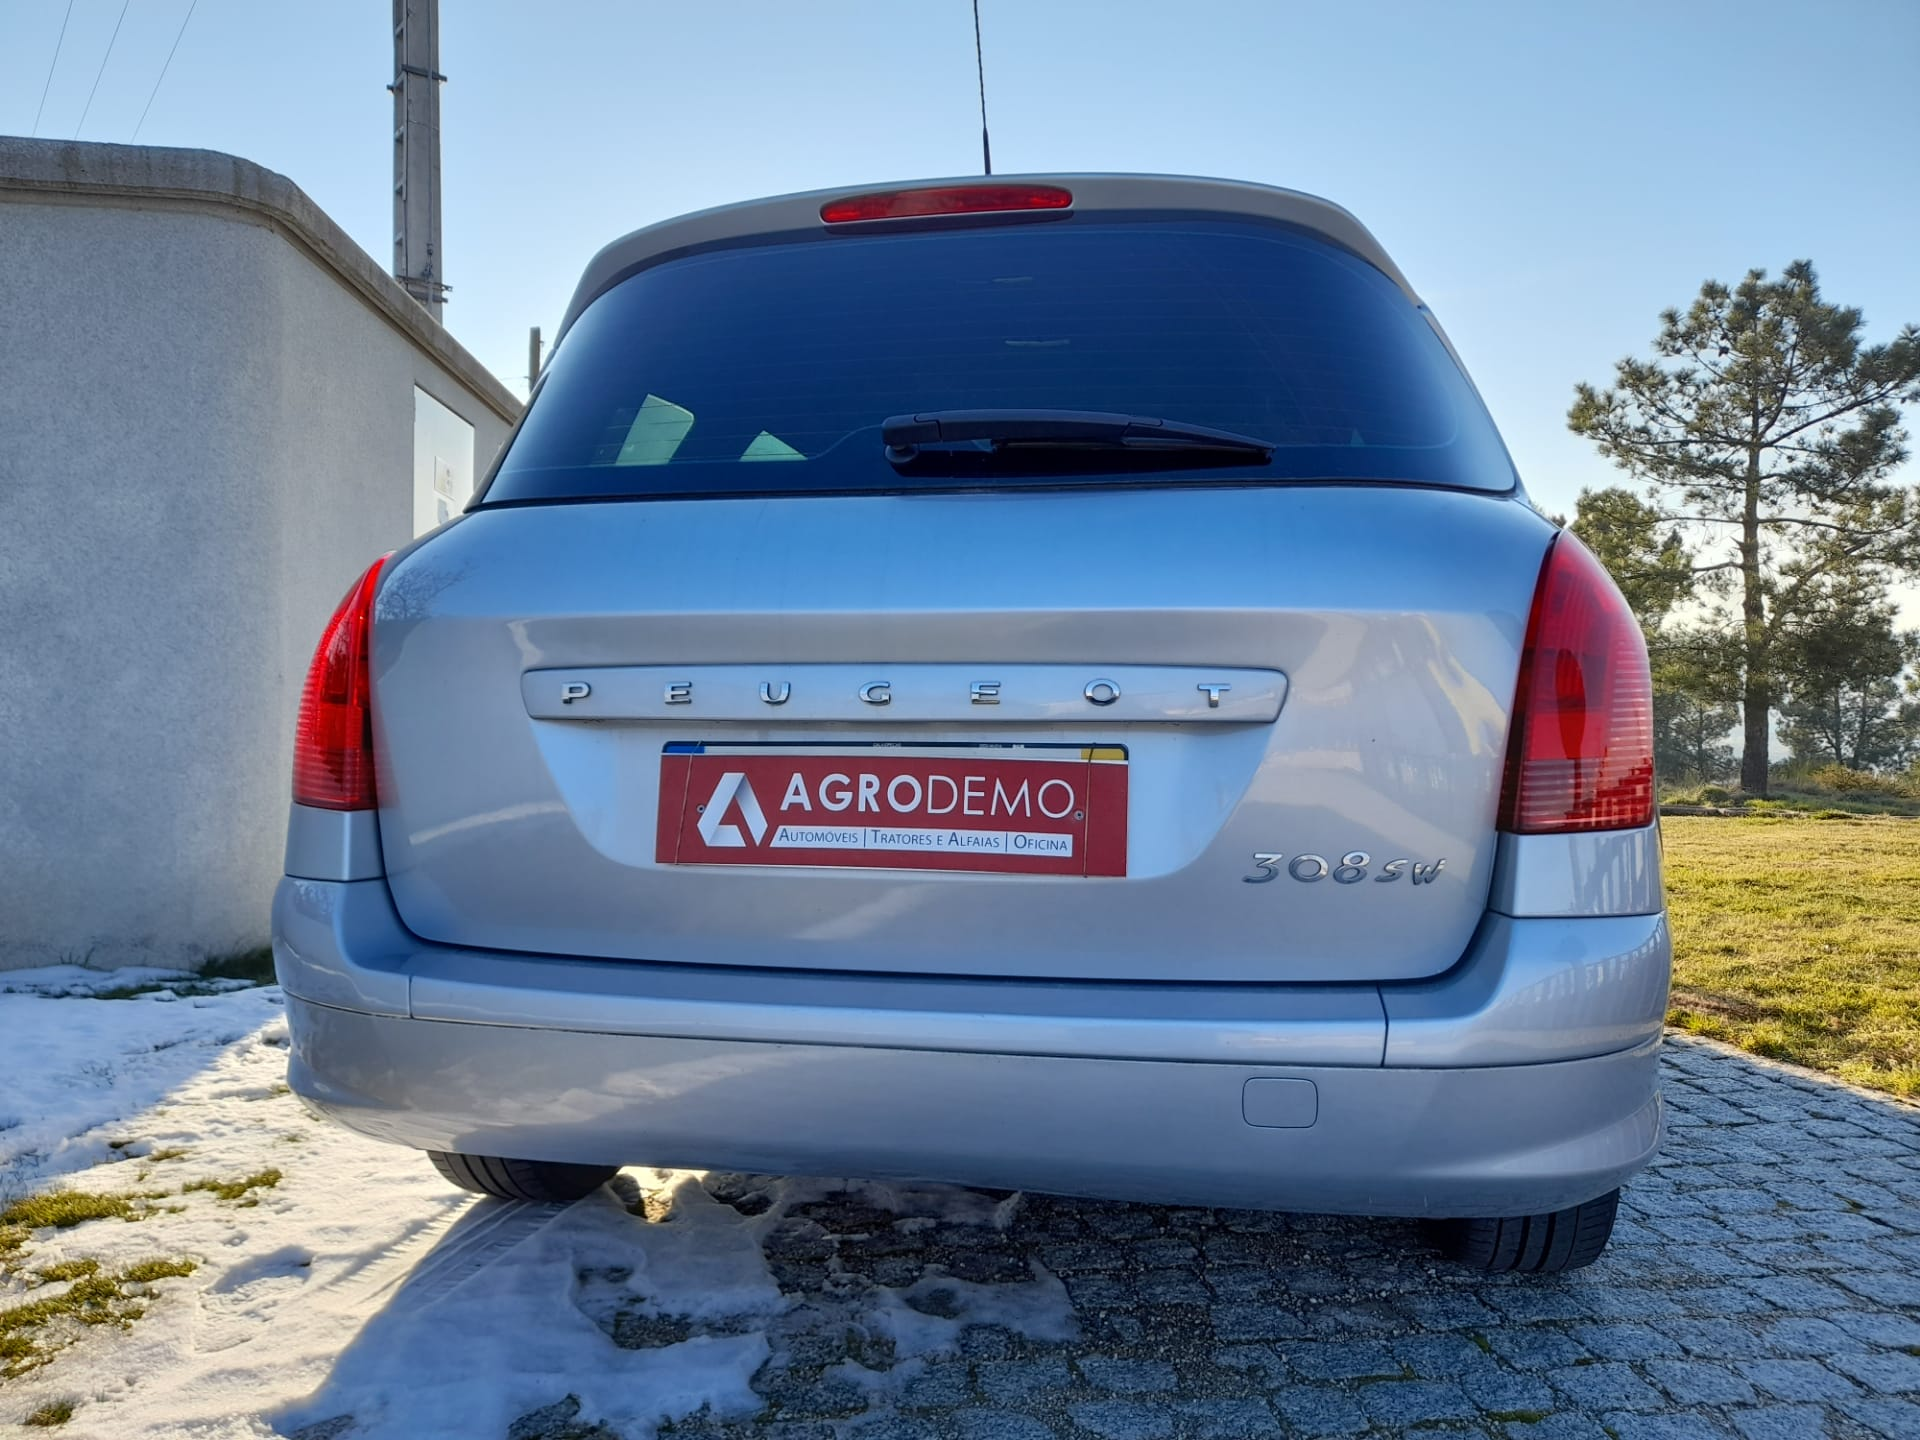 Peugeot 308 sw NAVTQ